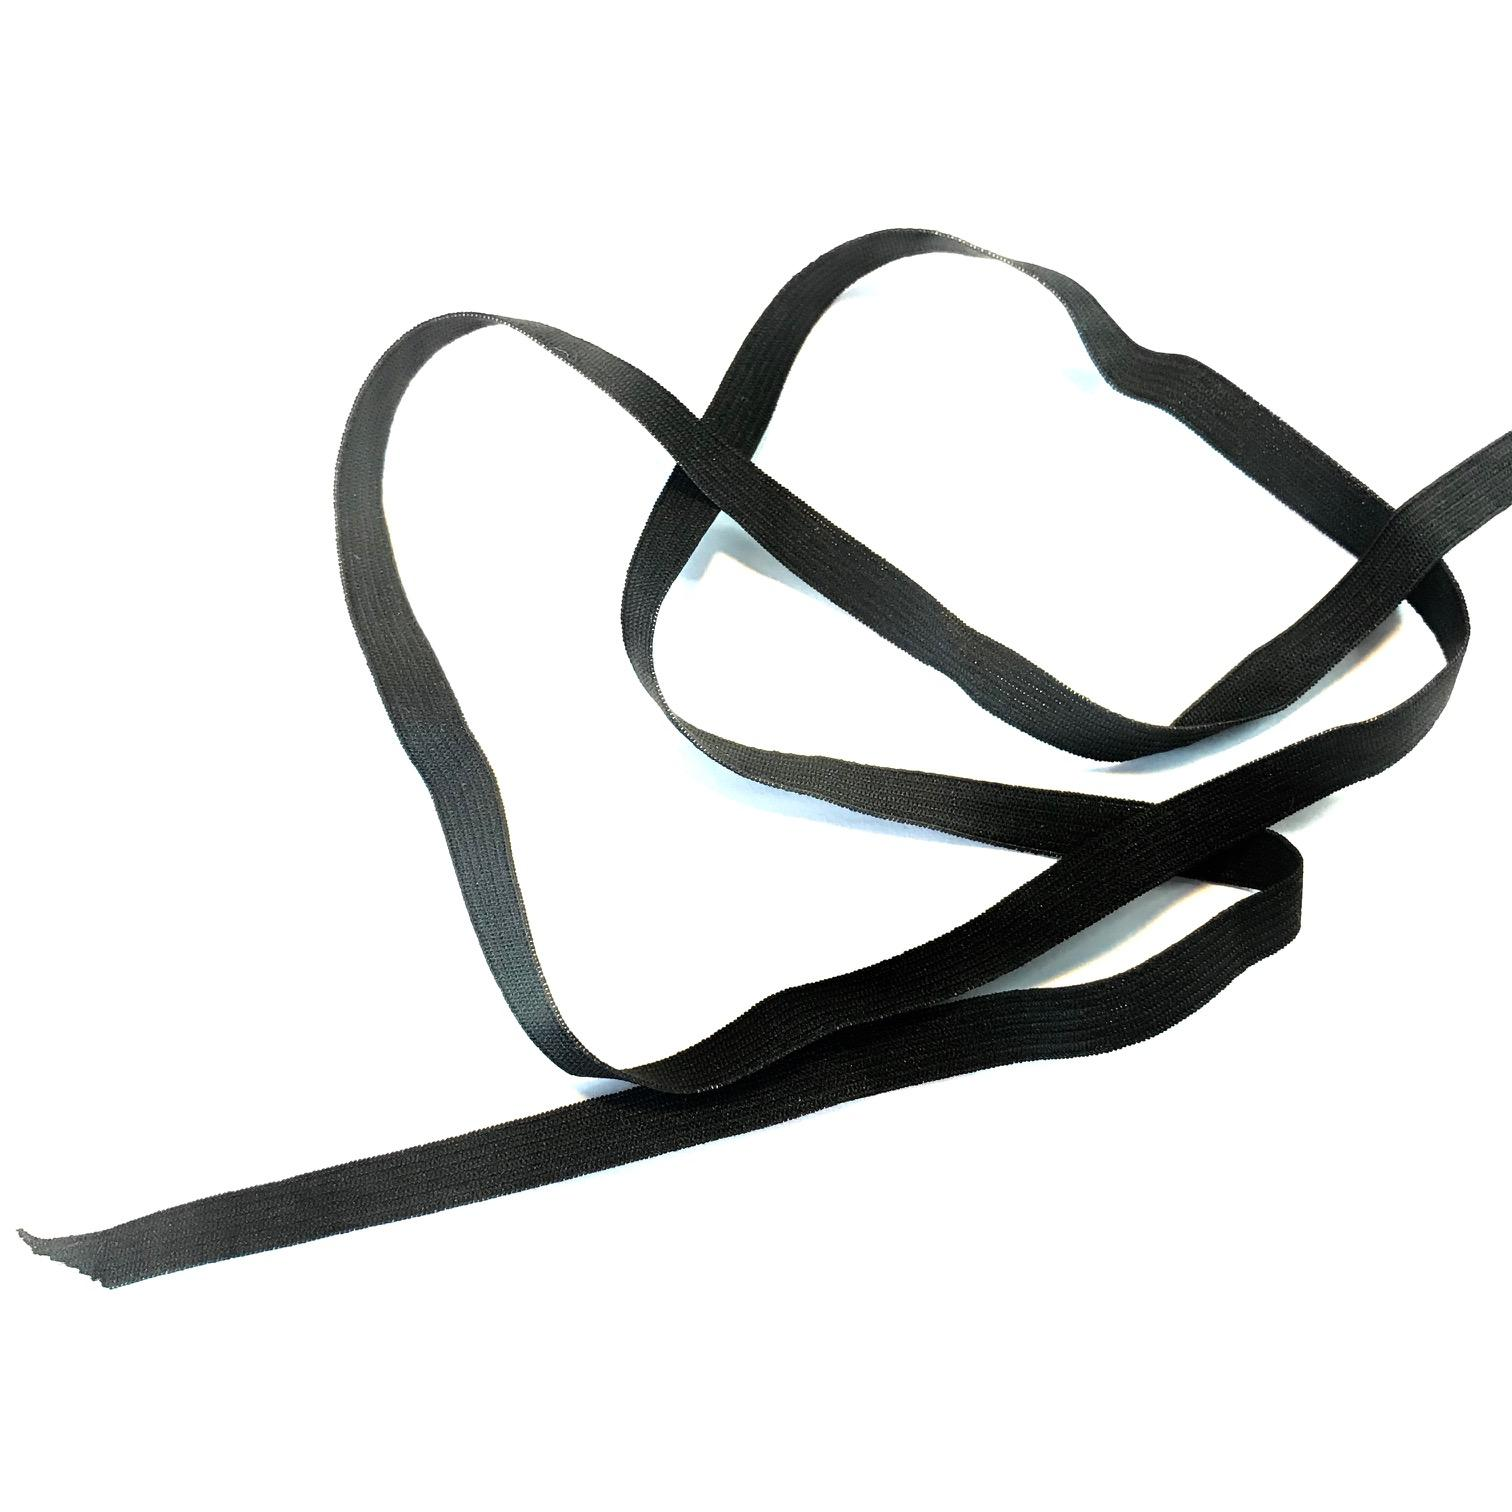 Elastique plat noir 7mm ideal masque